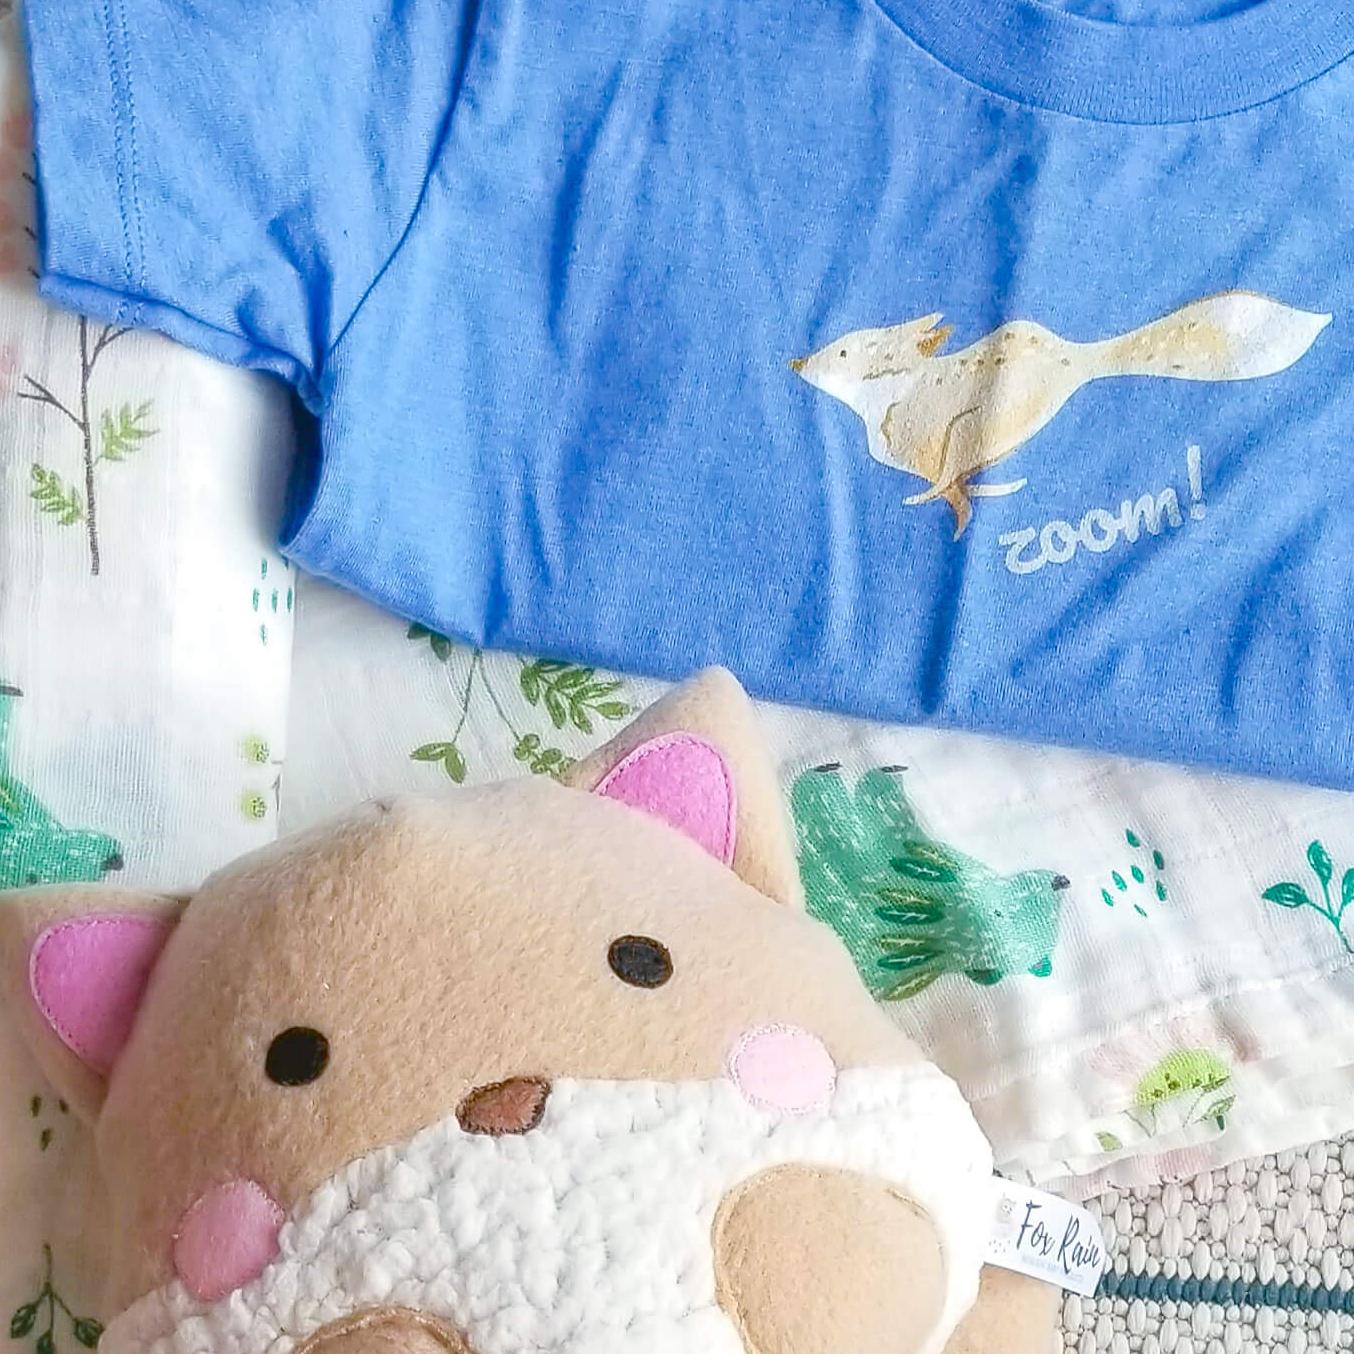 fox rain collection chungi the fox print tshirt toddler unisex and plush stuffed animal